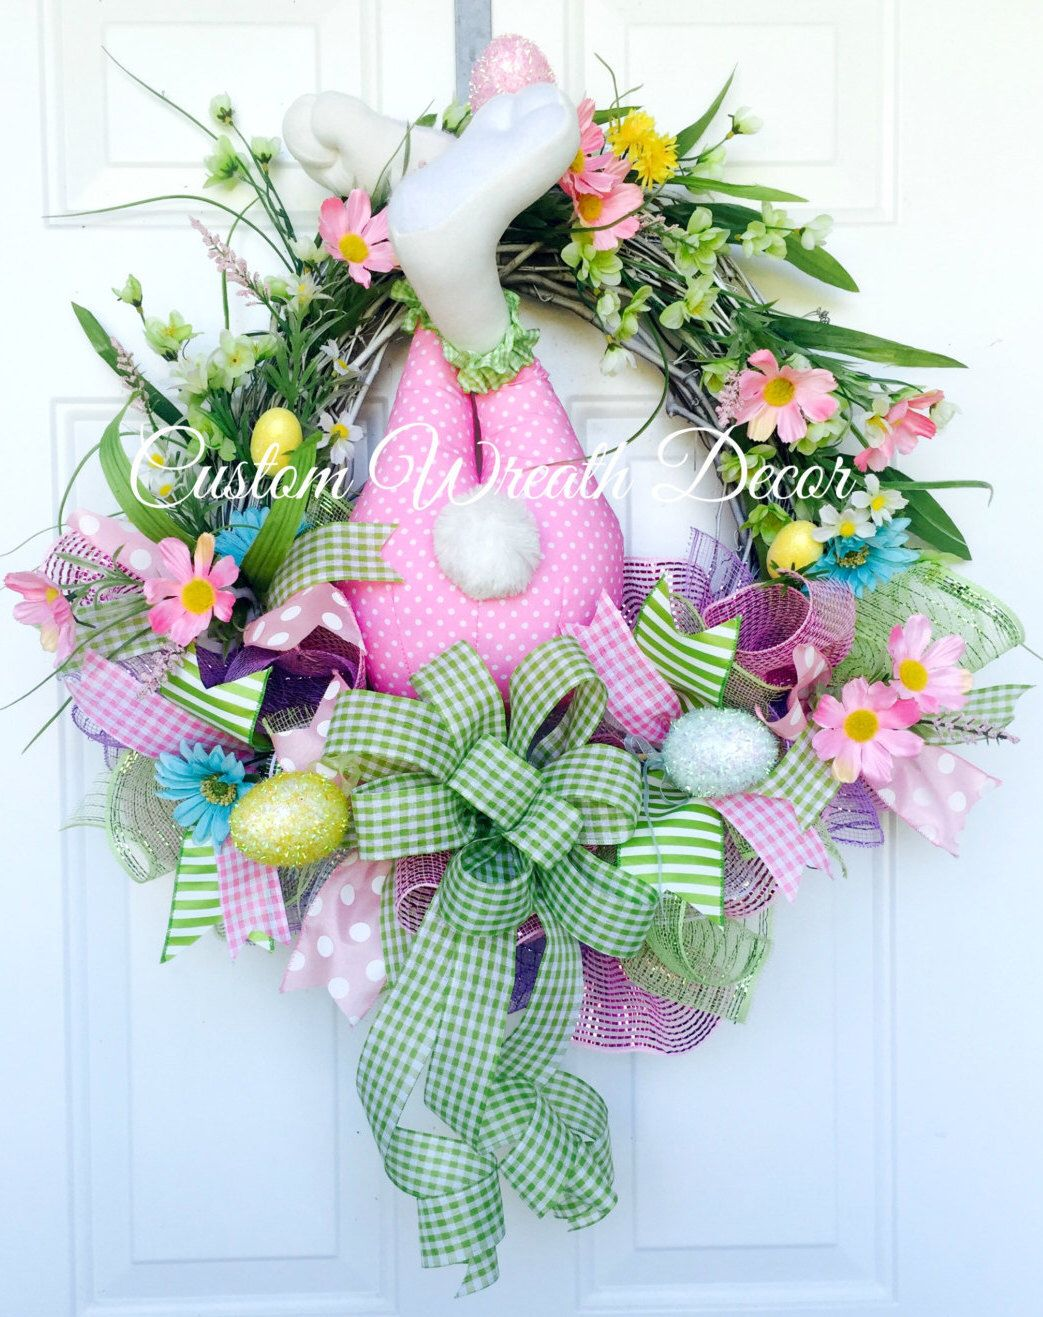 Easter Bunny Wreath, Bunny Butt Wreath, Bunny Bottom Wreath, Easter Grapevine Wreath, Spring Wreath by CustomWreathDecor on Etsy https://www.etsy.com/listing/269997408/easter-bunny-wreath-bunny-butt-wreath